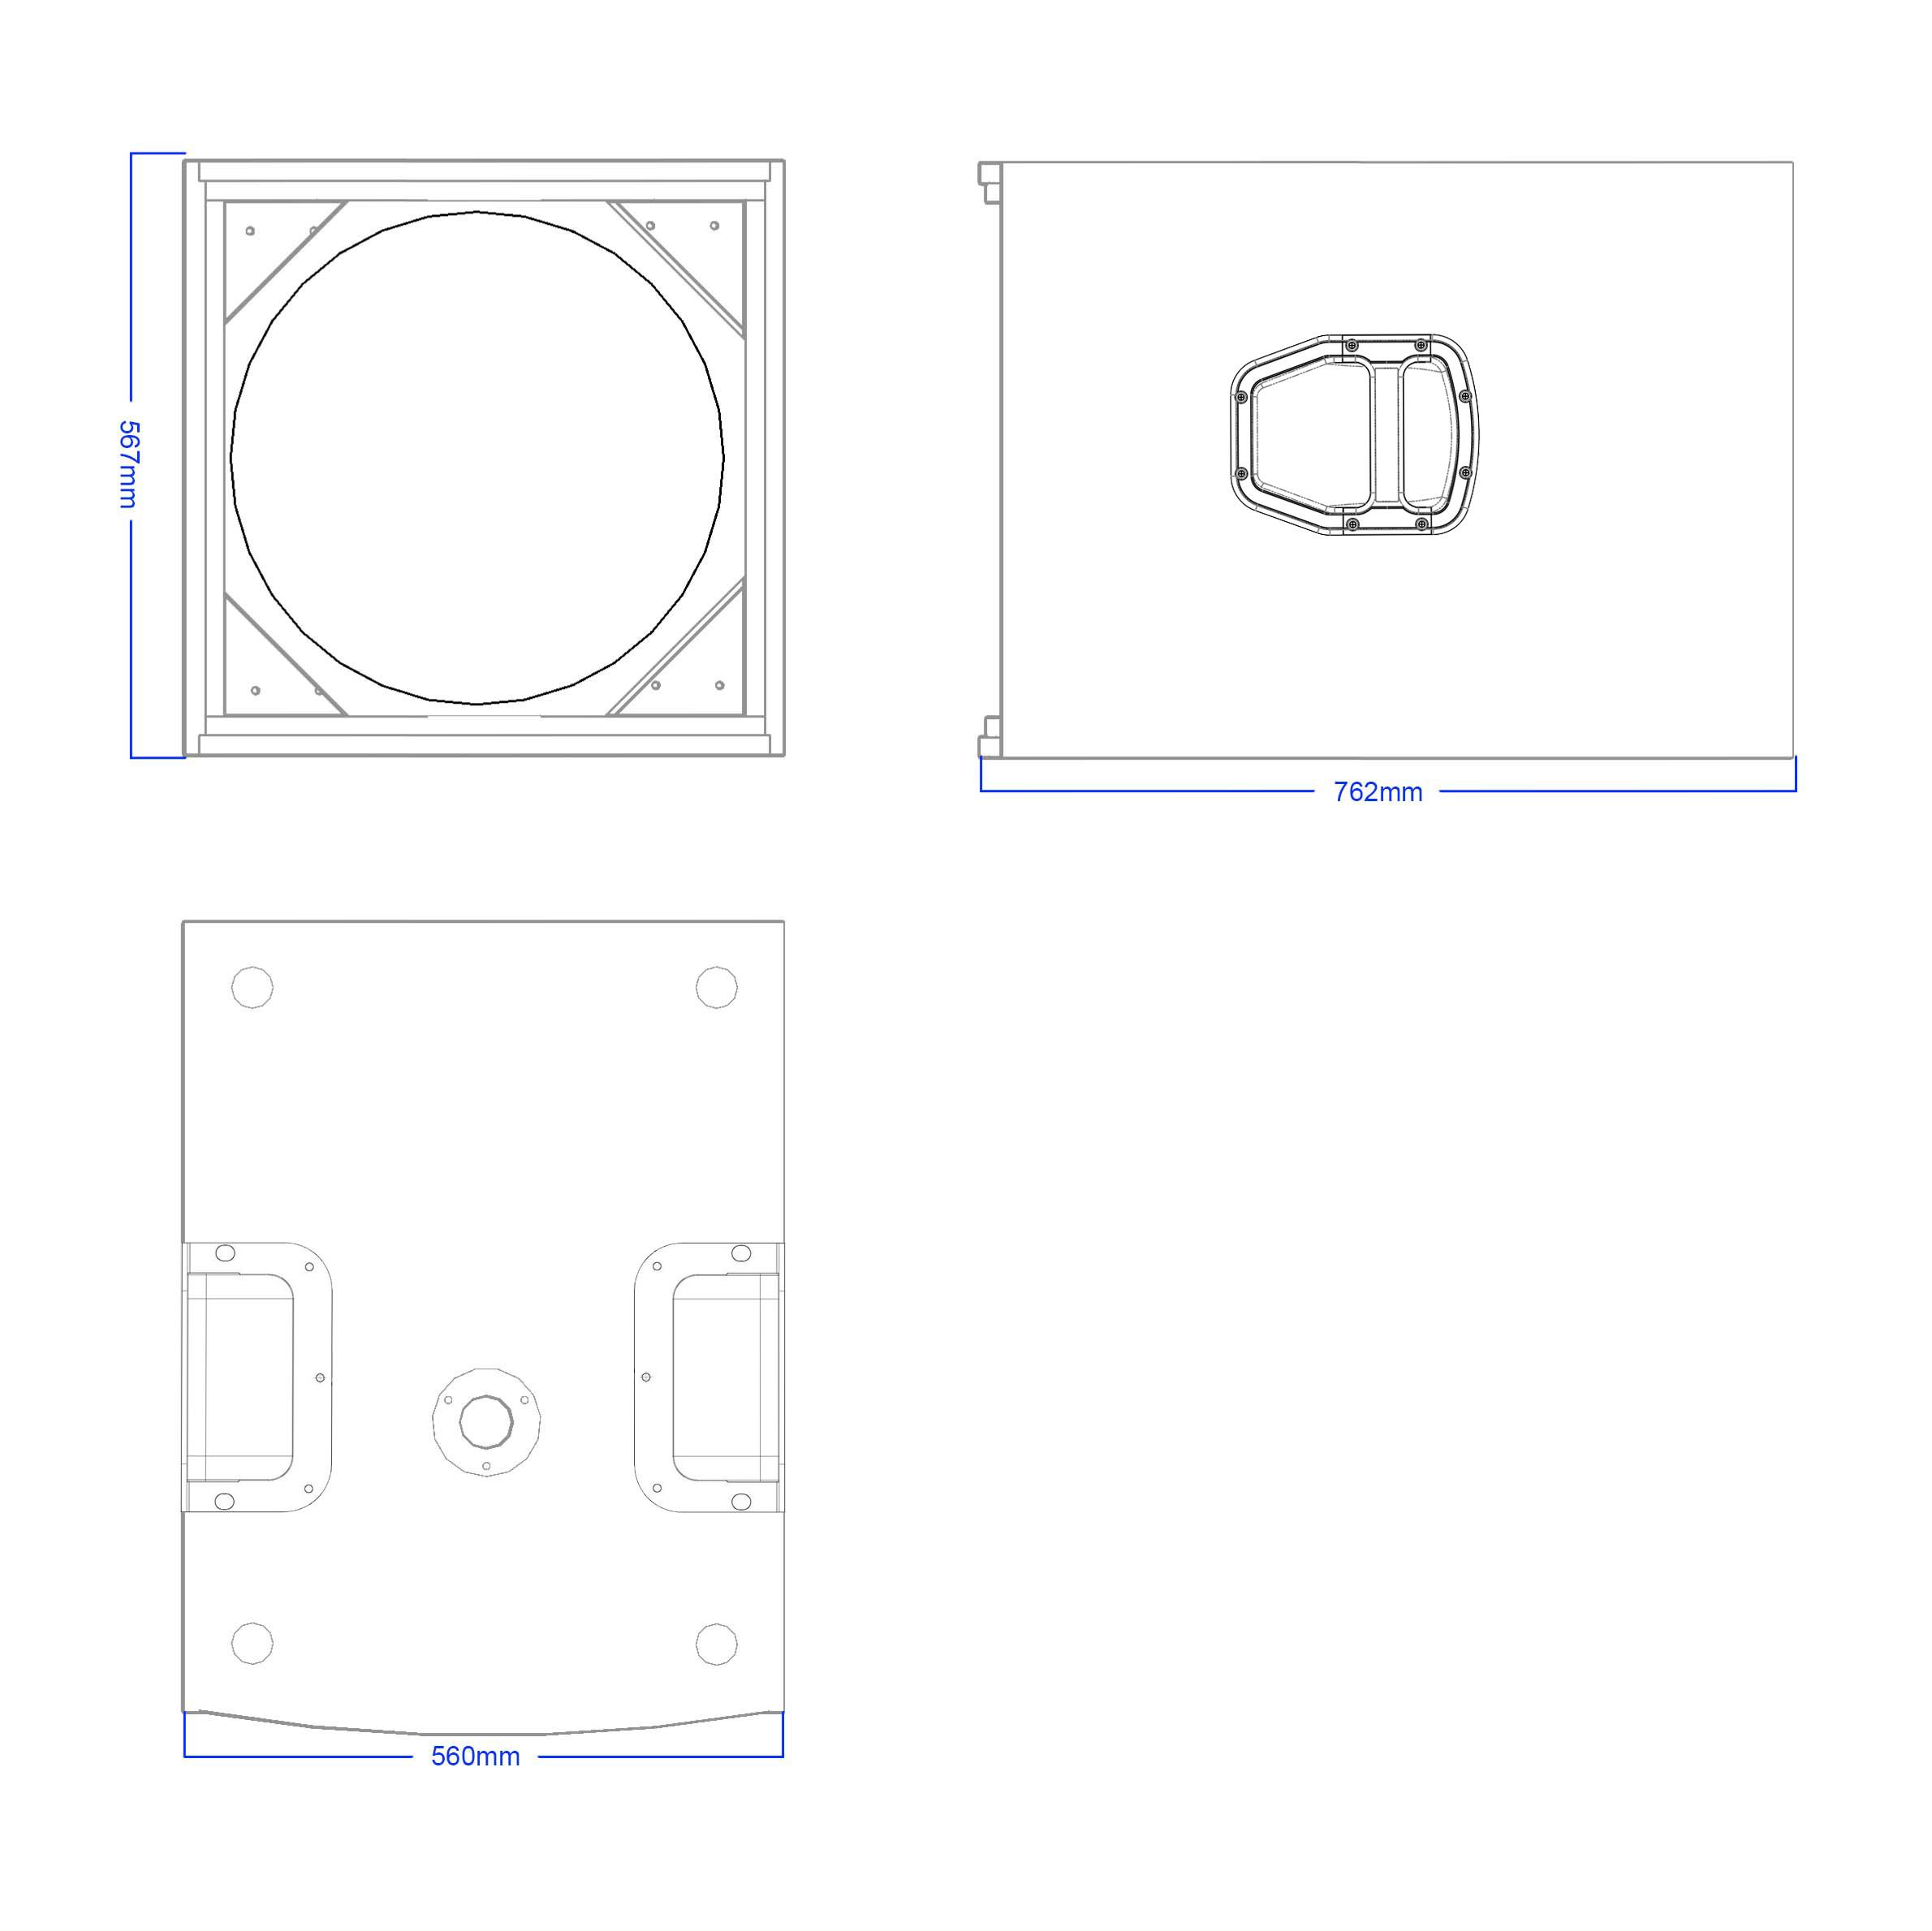 Apt SC 18.1MK2 Sub cabinet - 567, 762, 560mm